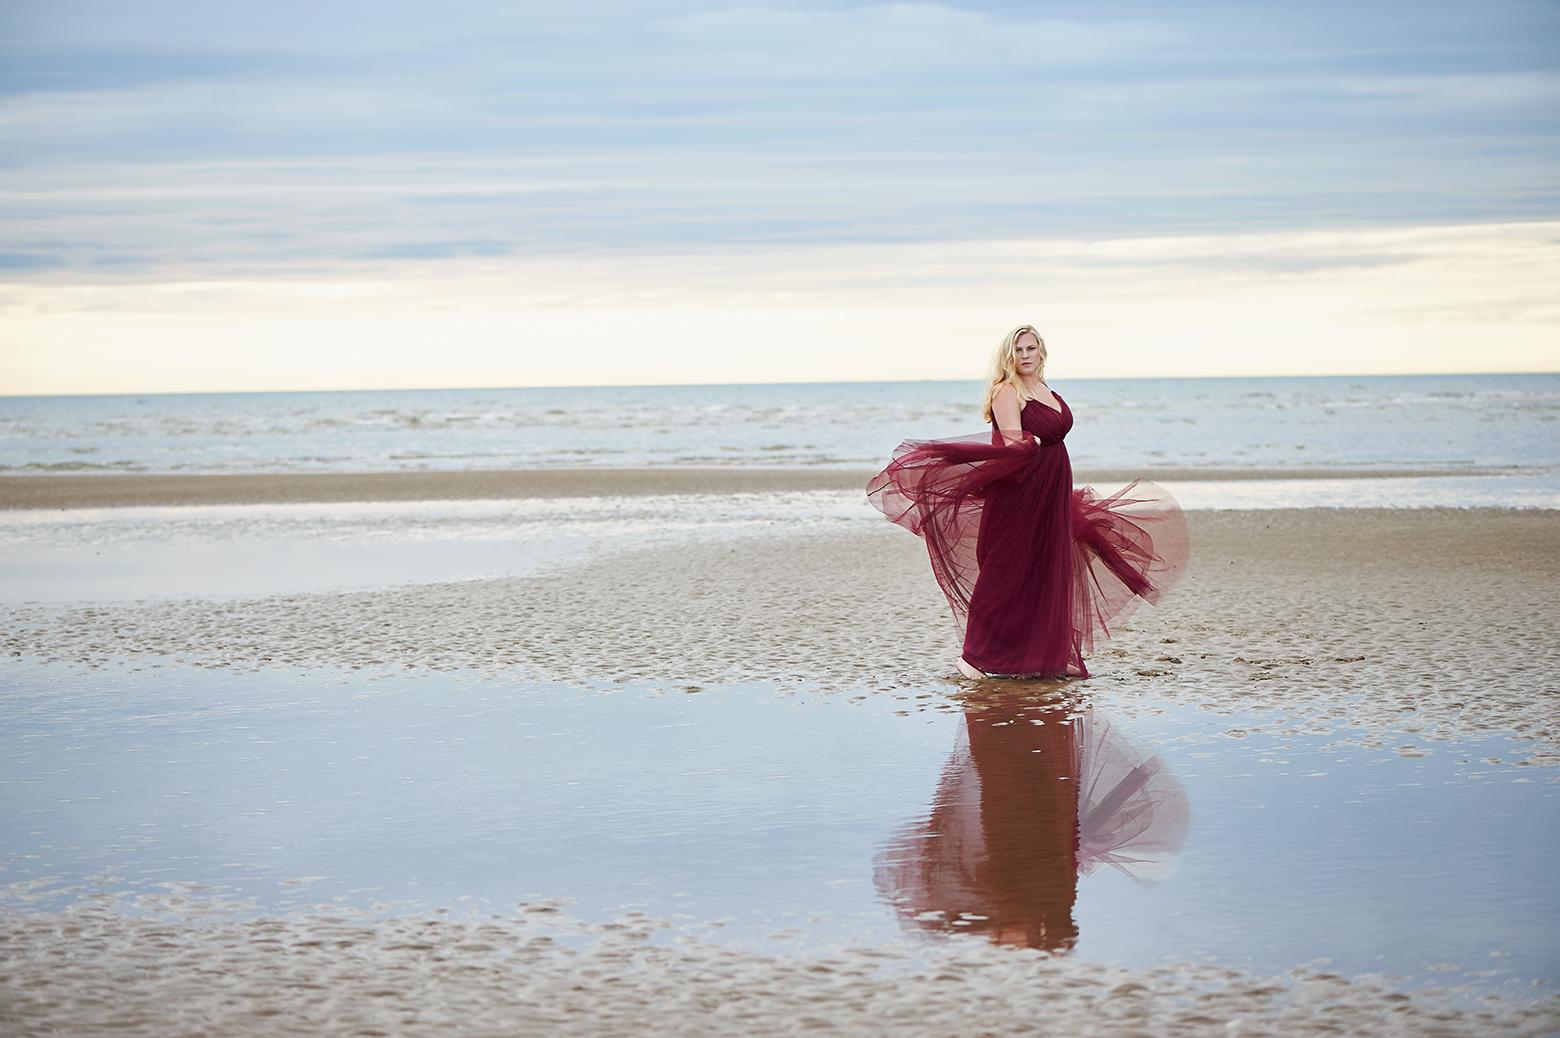 blackpool, england, resort, victorian, uk, my british summer, photos and the city, curves, portrait, dream photo shoot